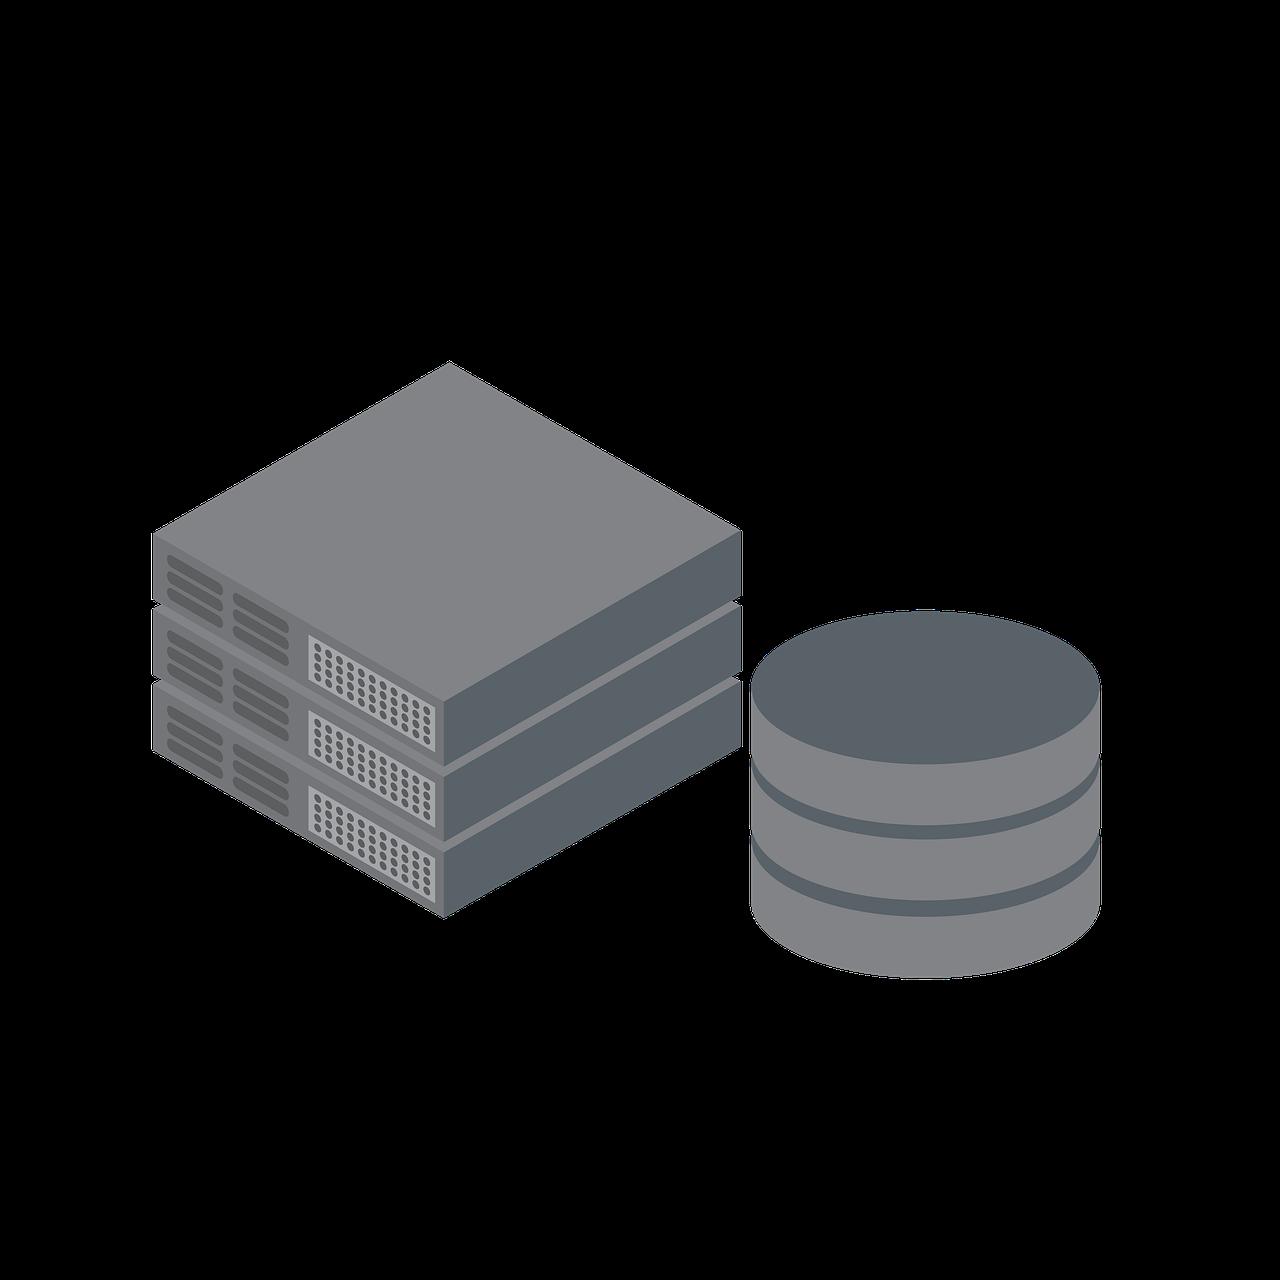 Server - DevOps Consulting | DevOps Consulting Company UK